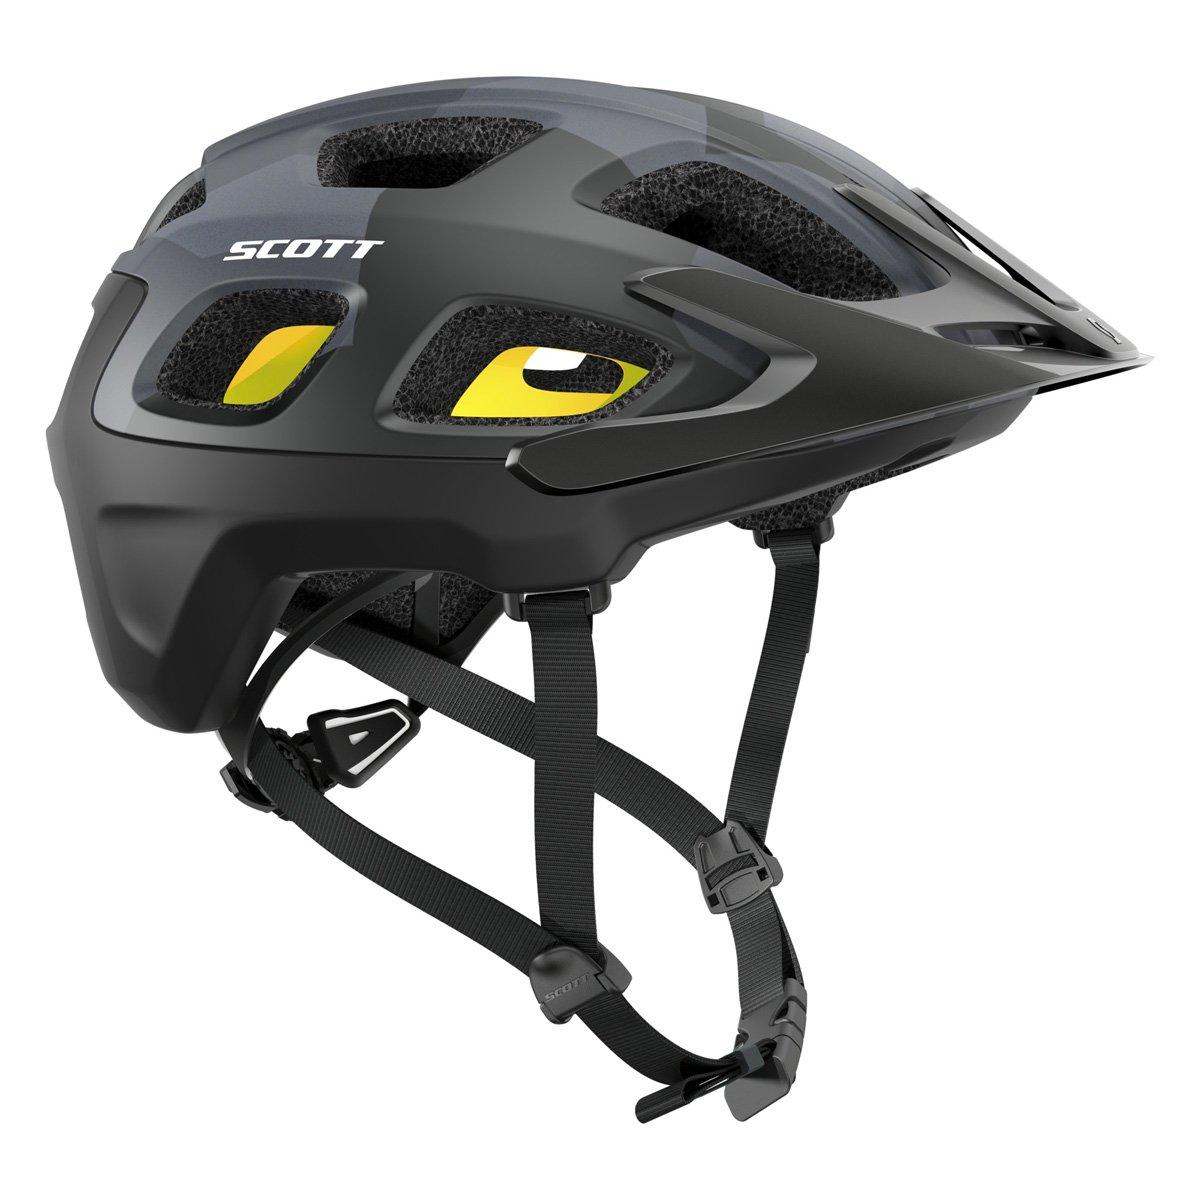 Scott Vivo PLUSバイクバイクヘルメット - ブラックカモミディアム   B019FIBVKK